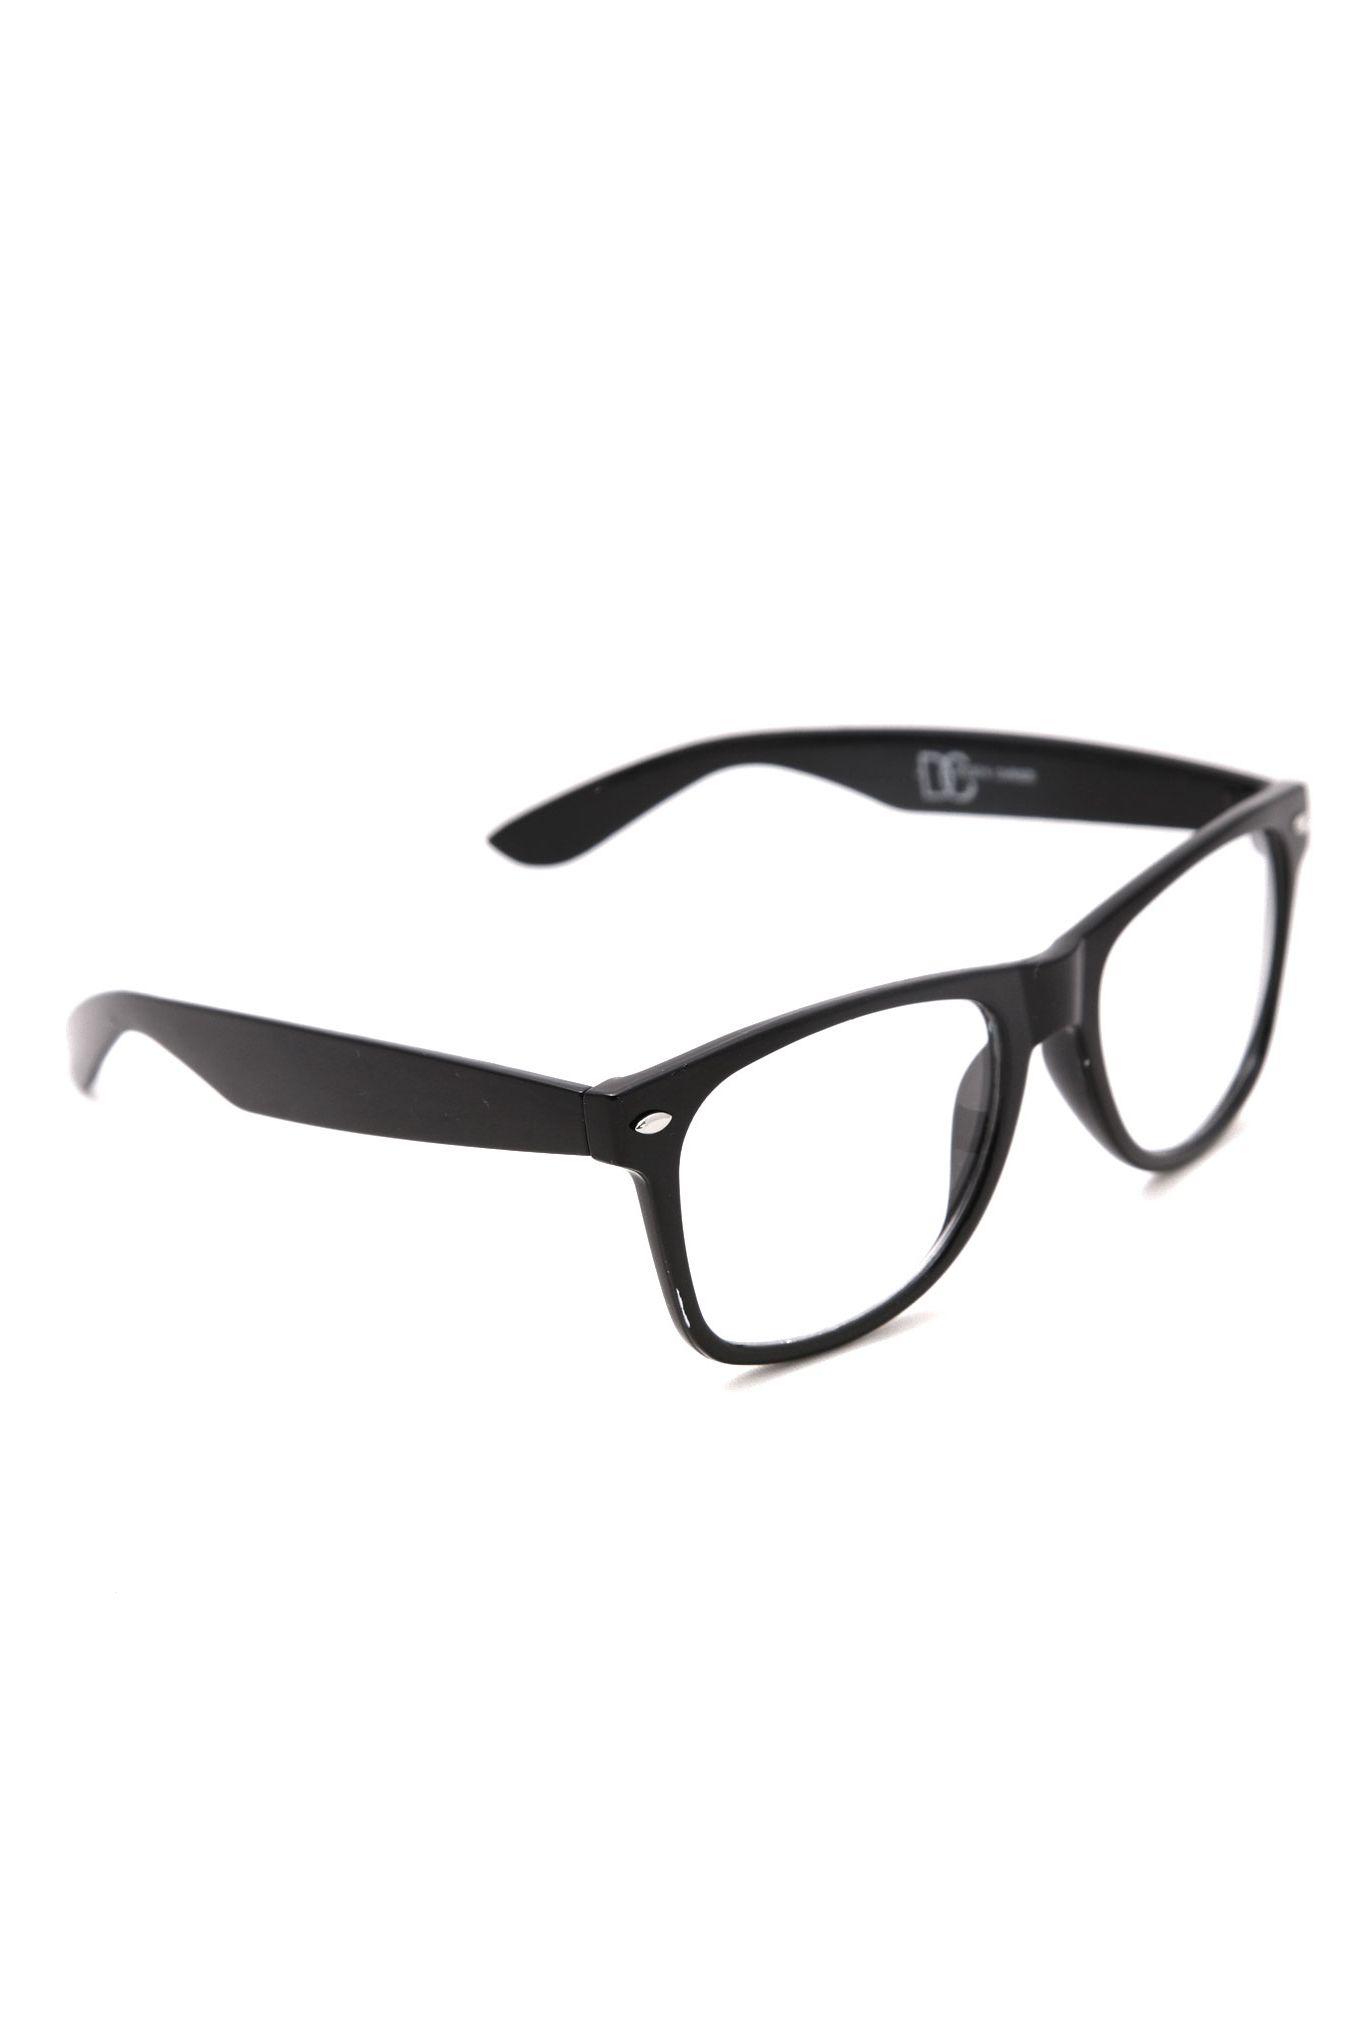 Nerd Glasses | #want | Pinterest | Glasses, Sunglasses and ...